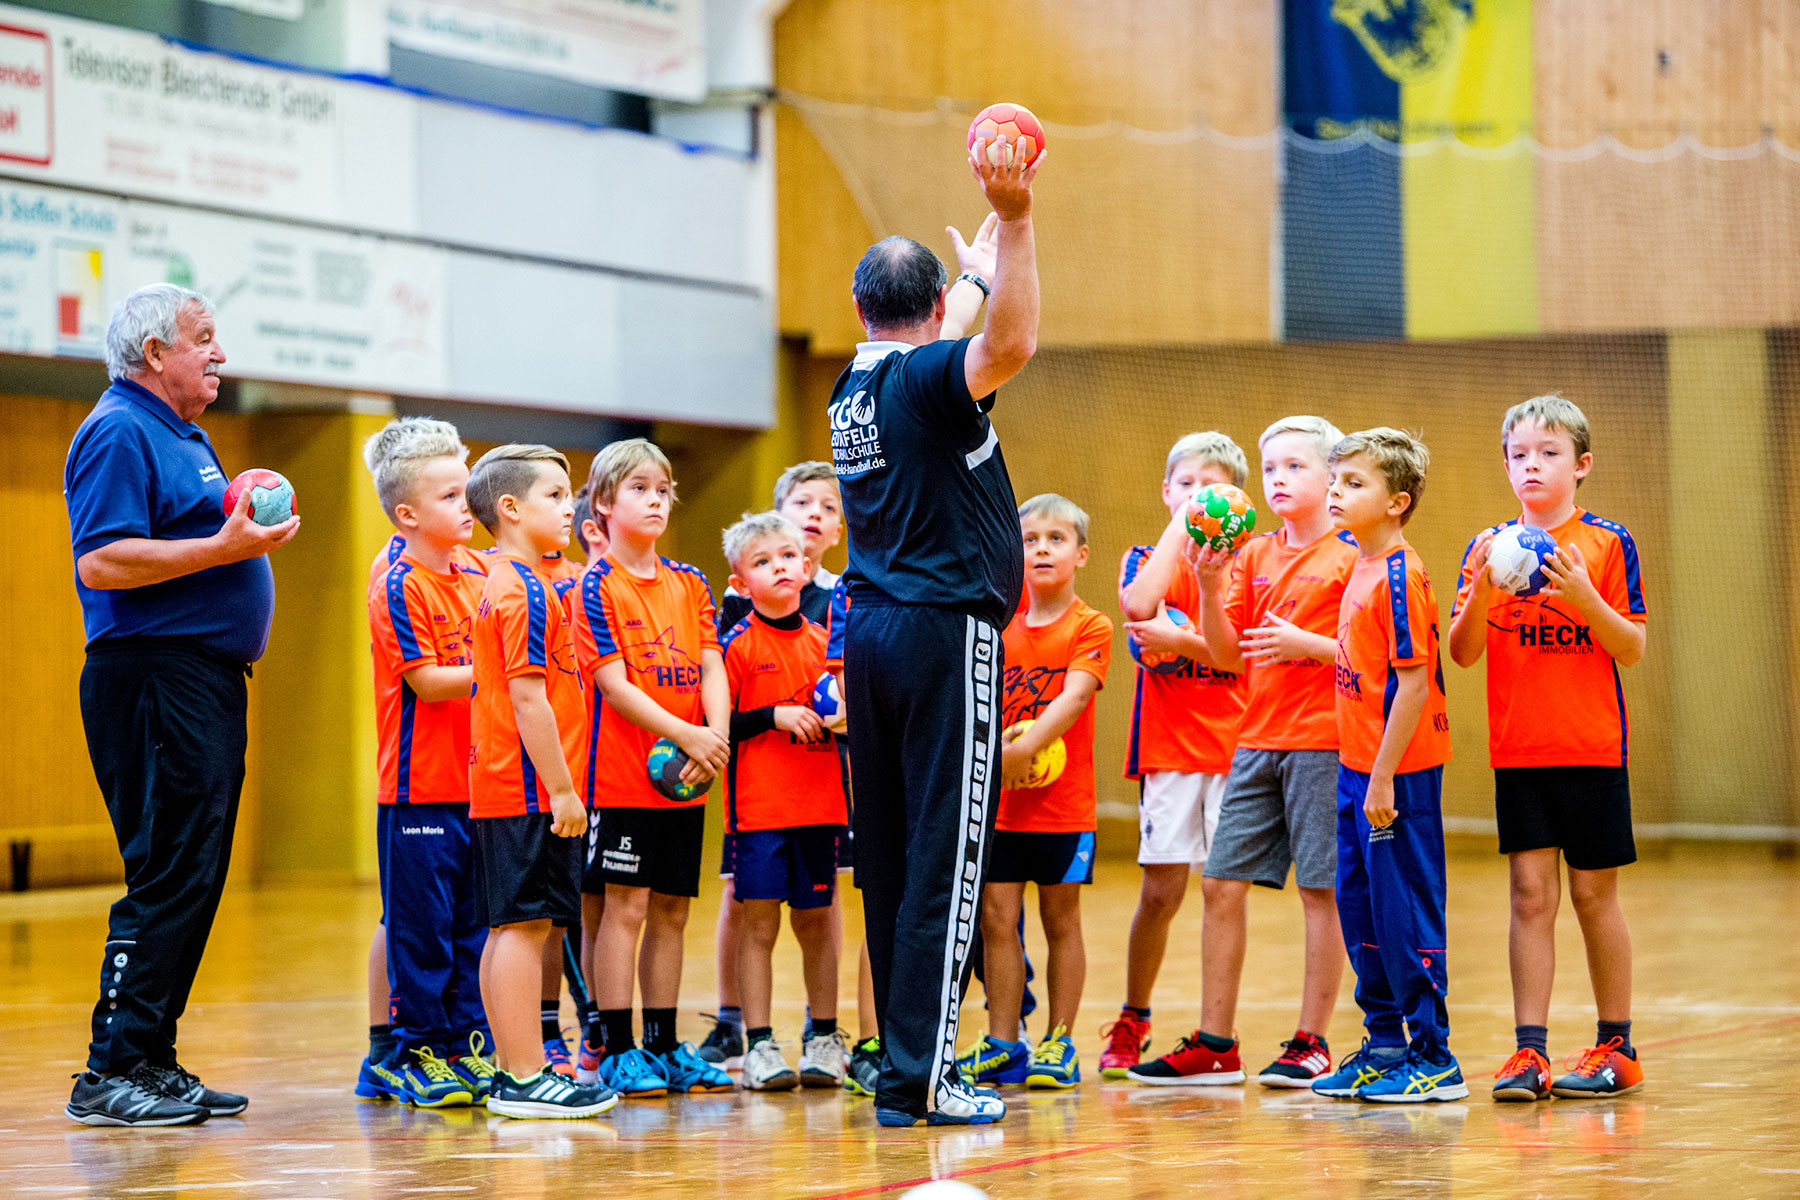 201809_Handballcamp_NDH (1)